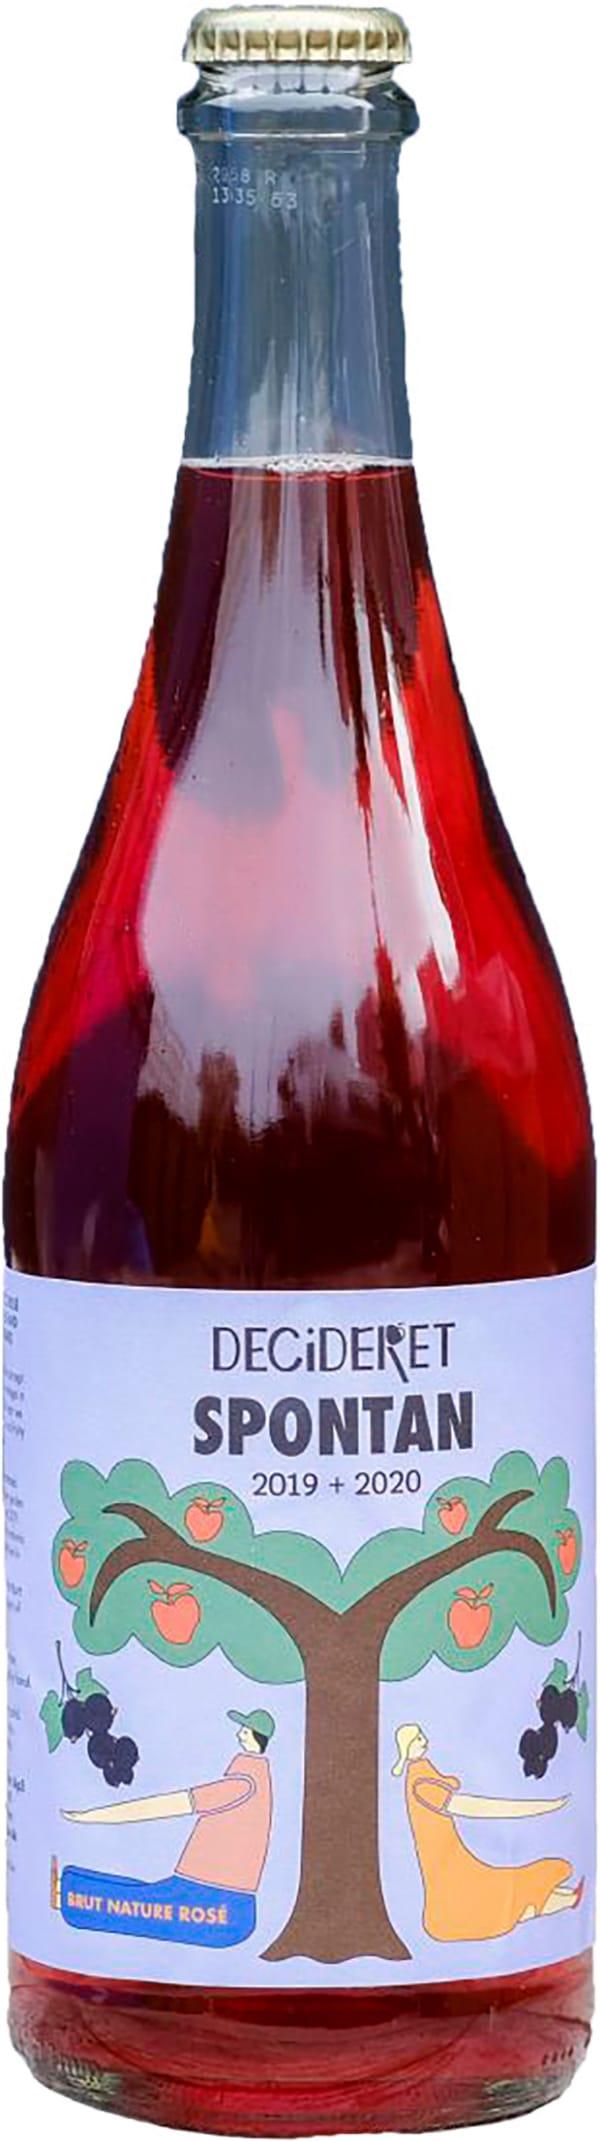 Decideret Spontan Brut Nature Rosé Cider